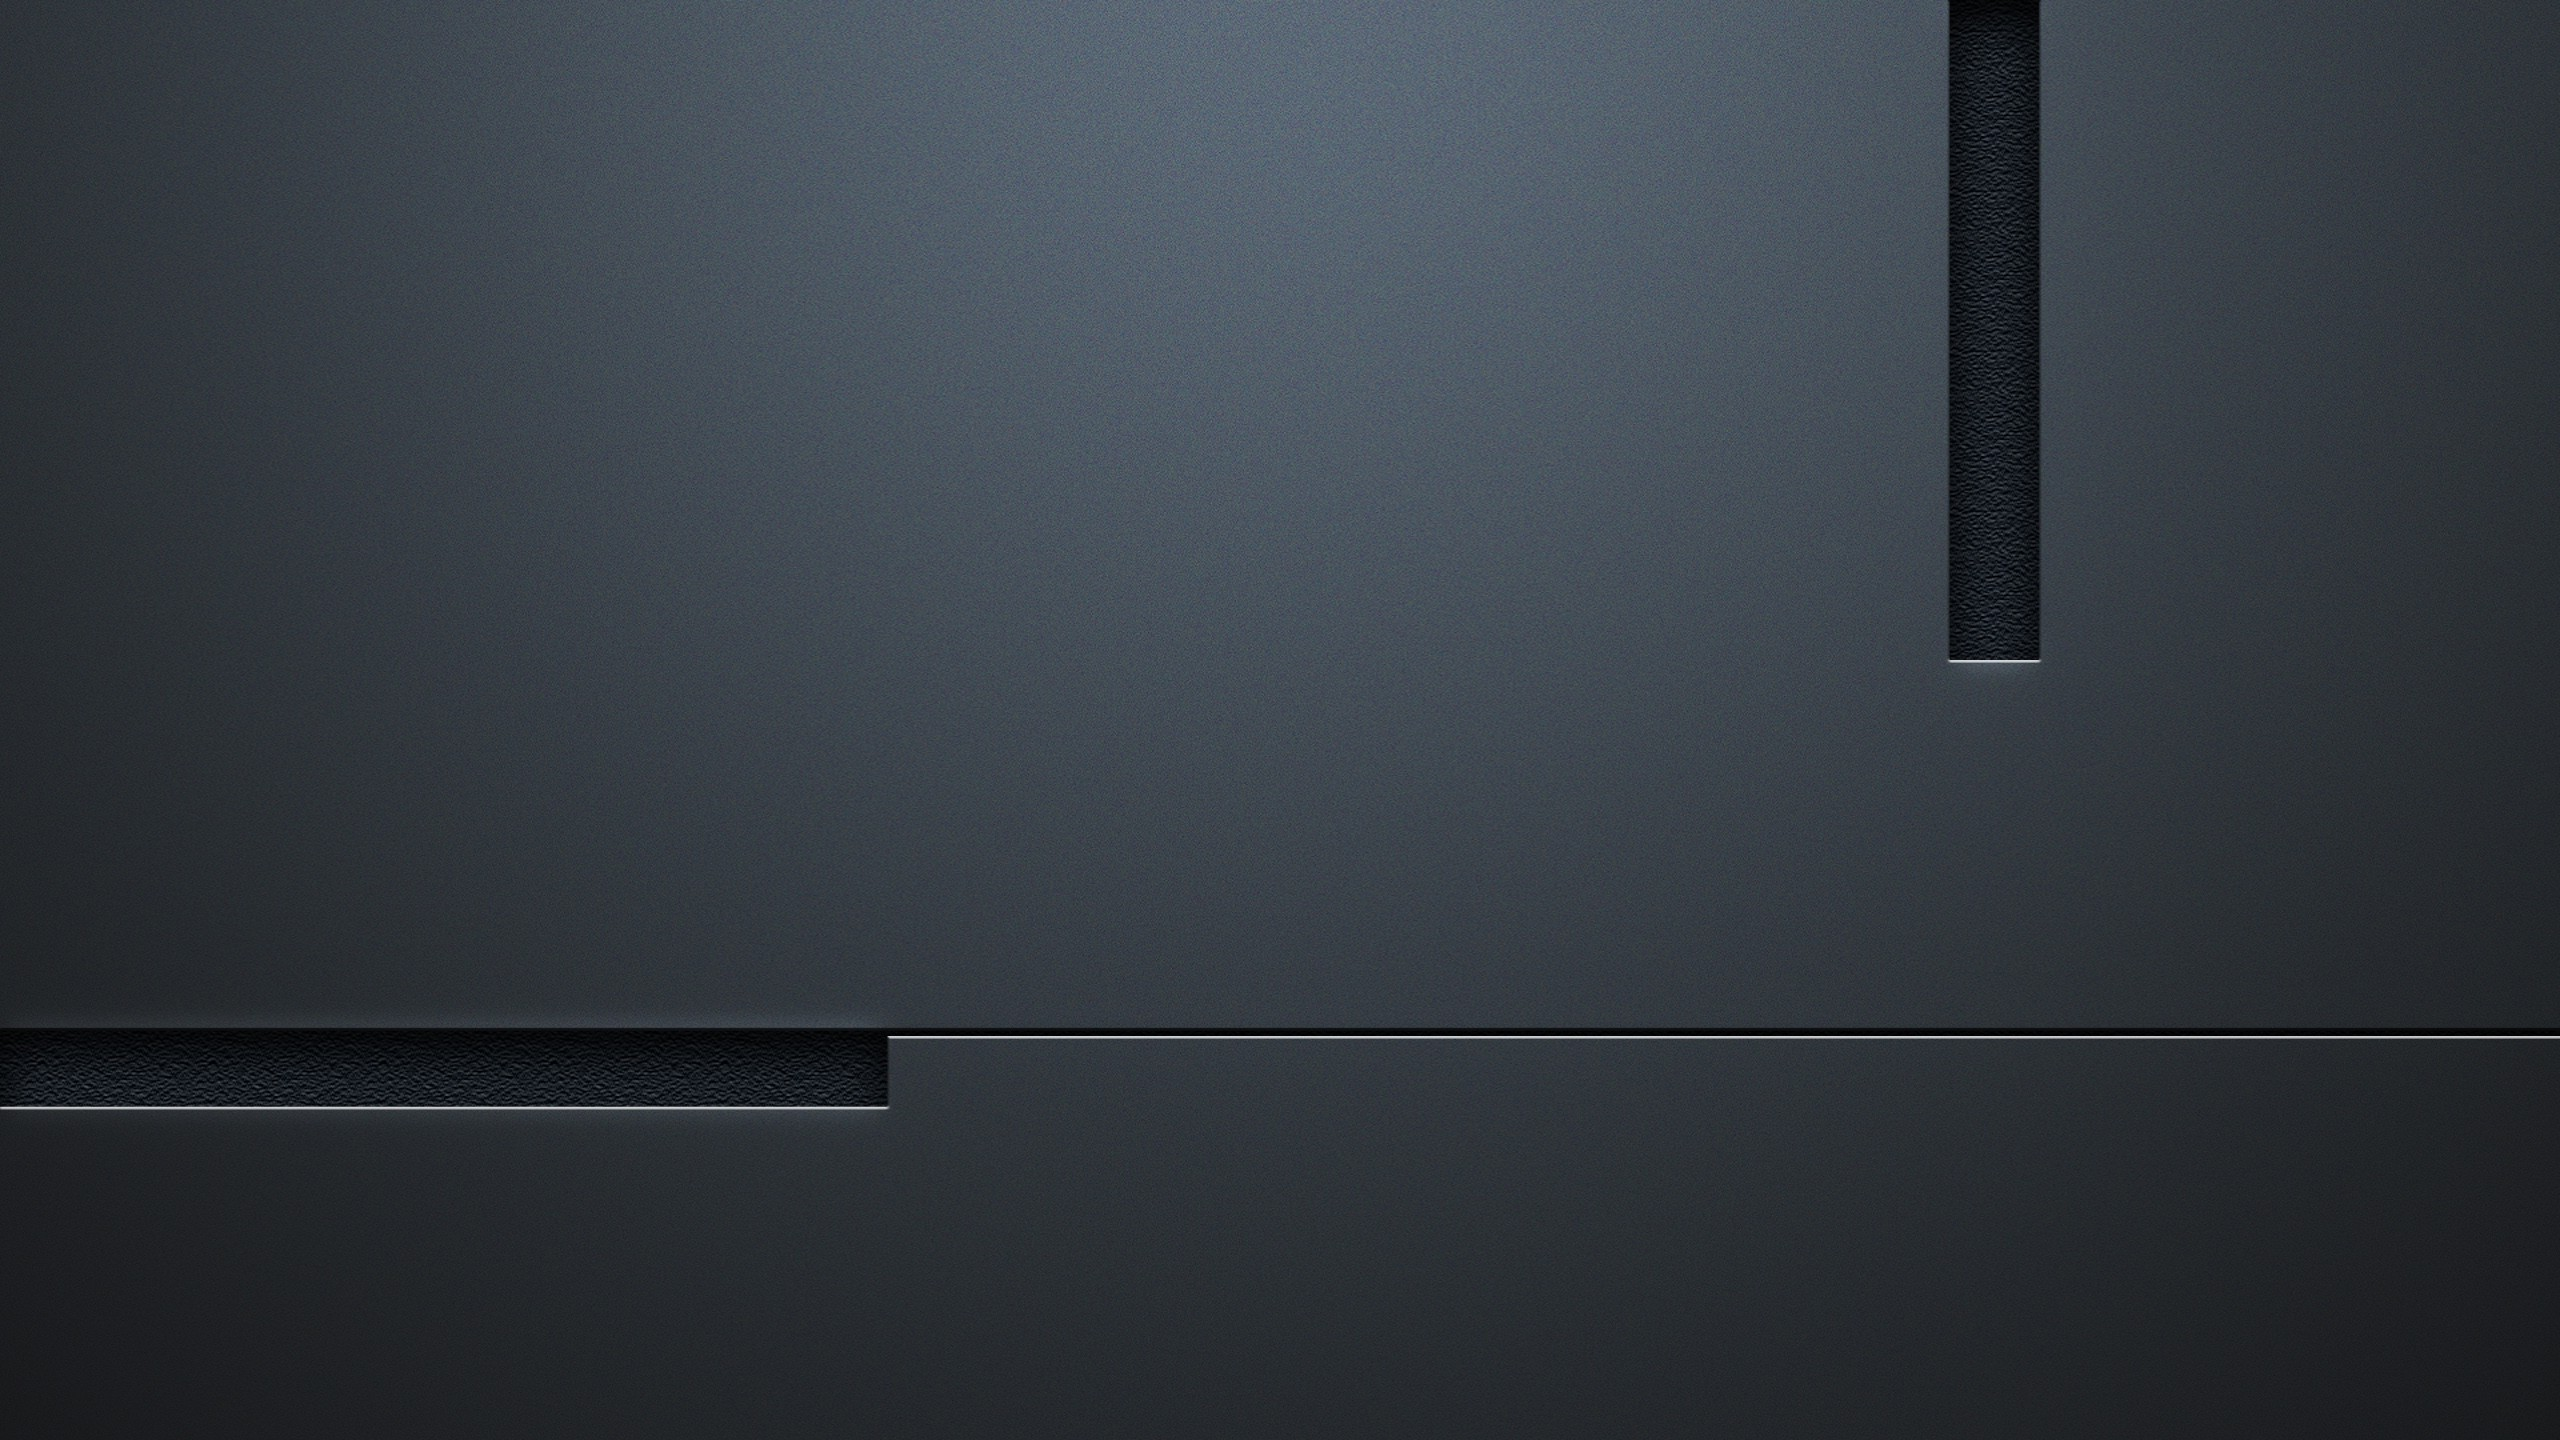 … Metal texture HD Wallpaper 2560×1440